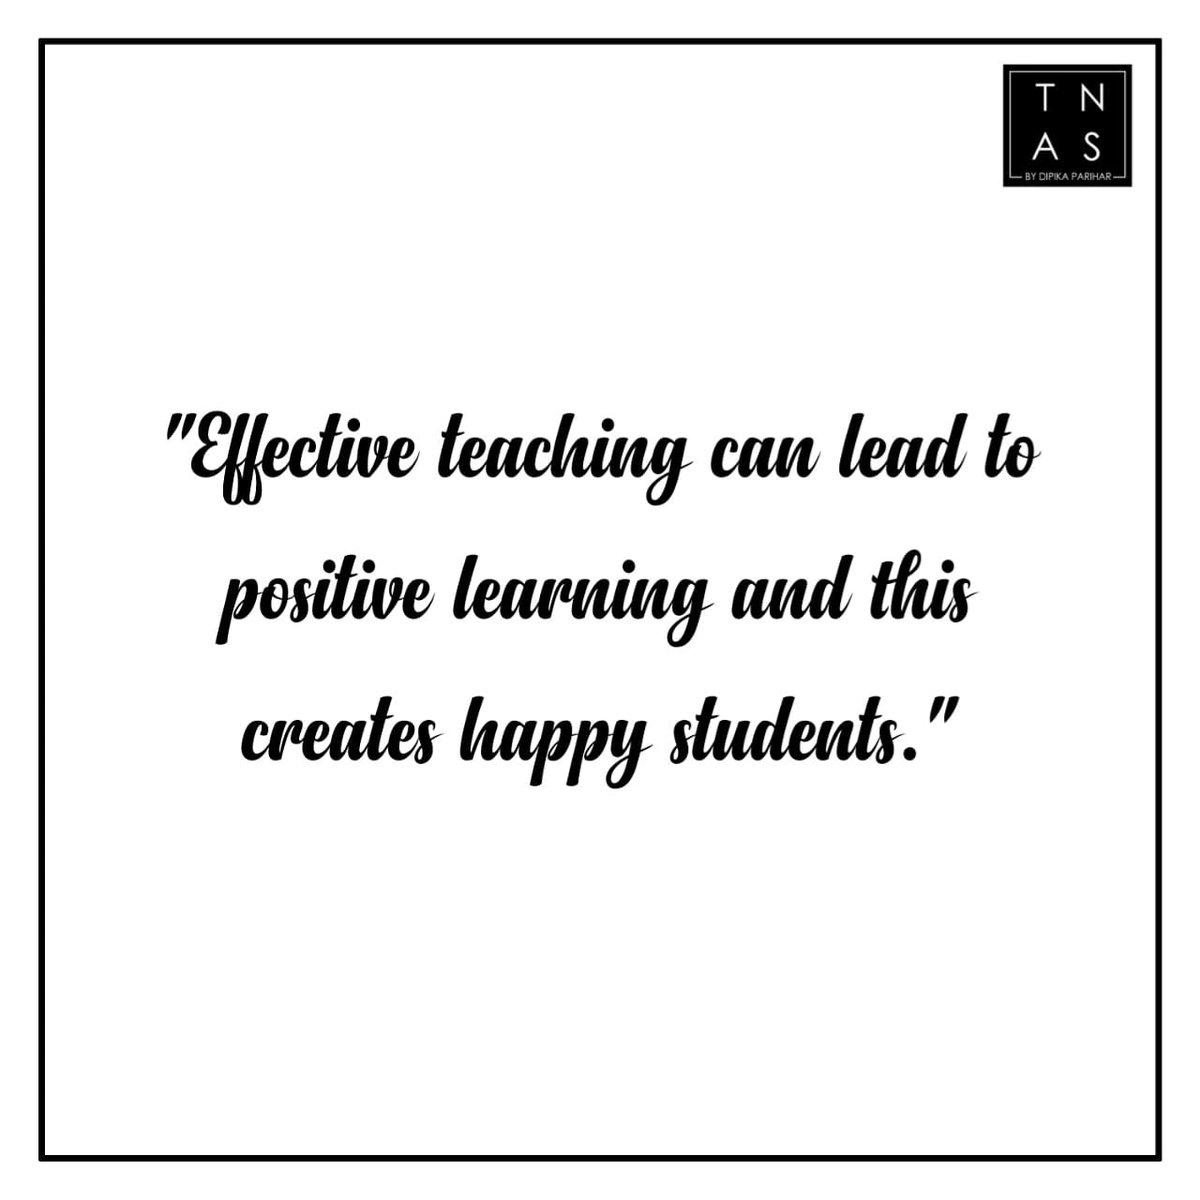 """The students if taught with curiosity can continue the learning process as long as they live.""  Academy at - Mumbai   Bengaluru   Kolkata  #TheNailArtSchool #NailArt #NailArtist #Nailsofinstagram #NailLovers #Nails #Nailssalon #Nailspofessional #Nailsdesigns #Learn #Learnnailartpic.twitter.com/0LJfV69Gpv"